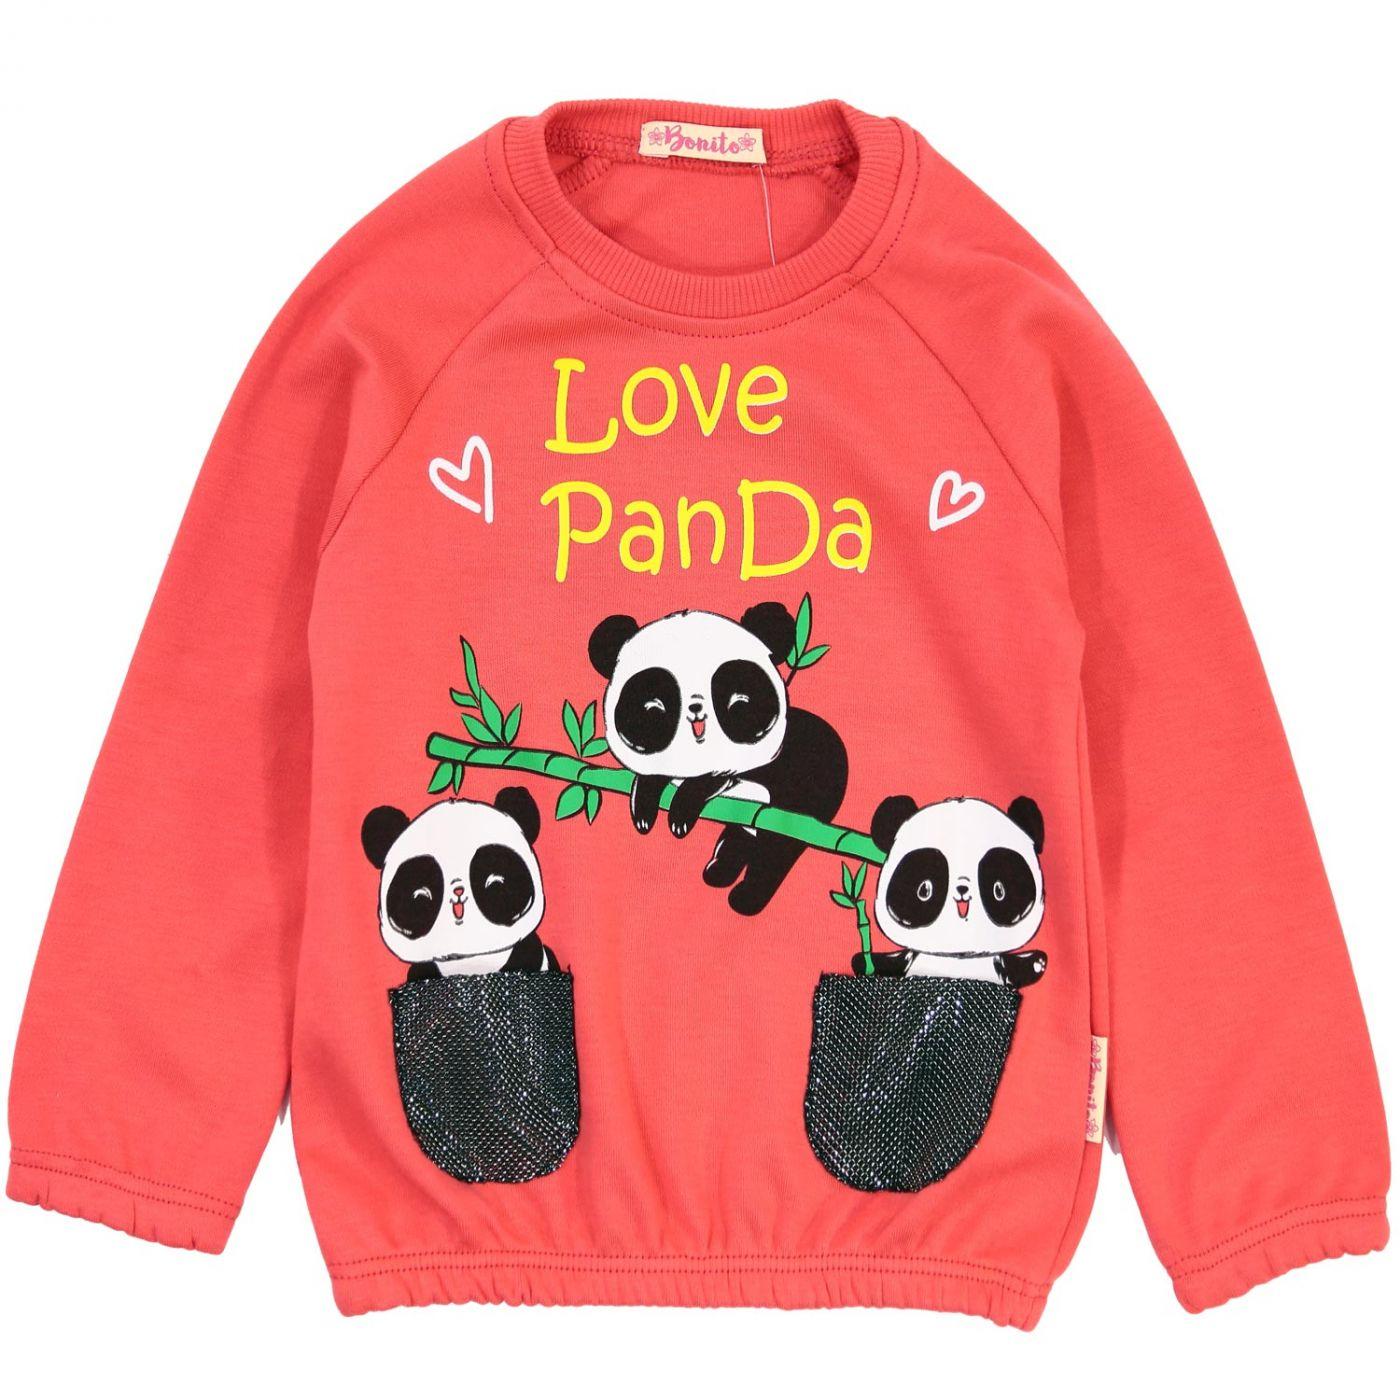 "Кофта для девочек Bonito ""Love Panda"""